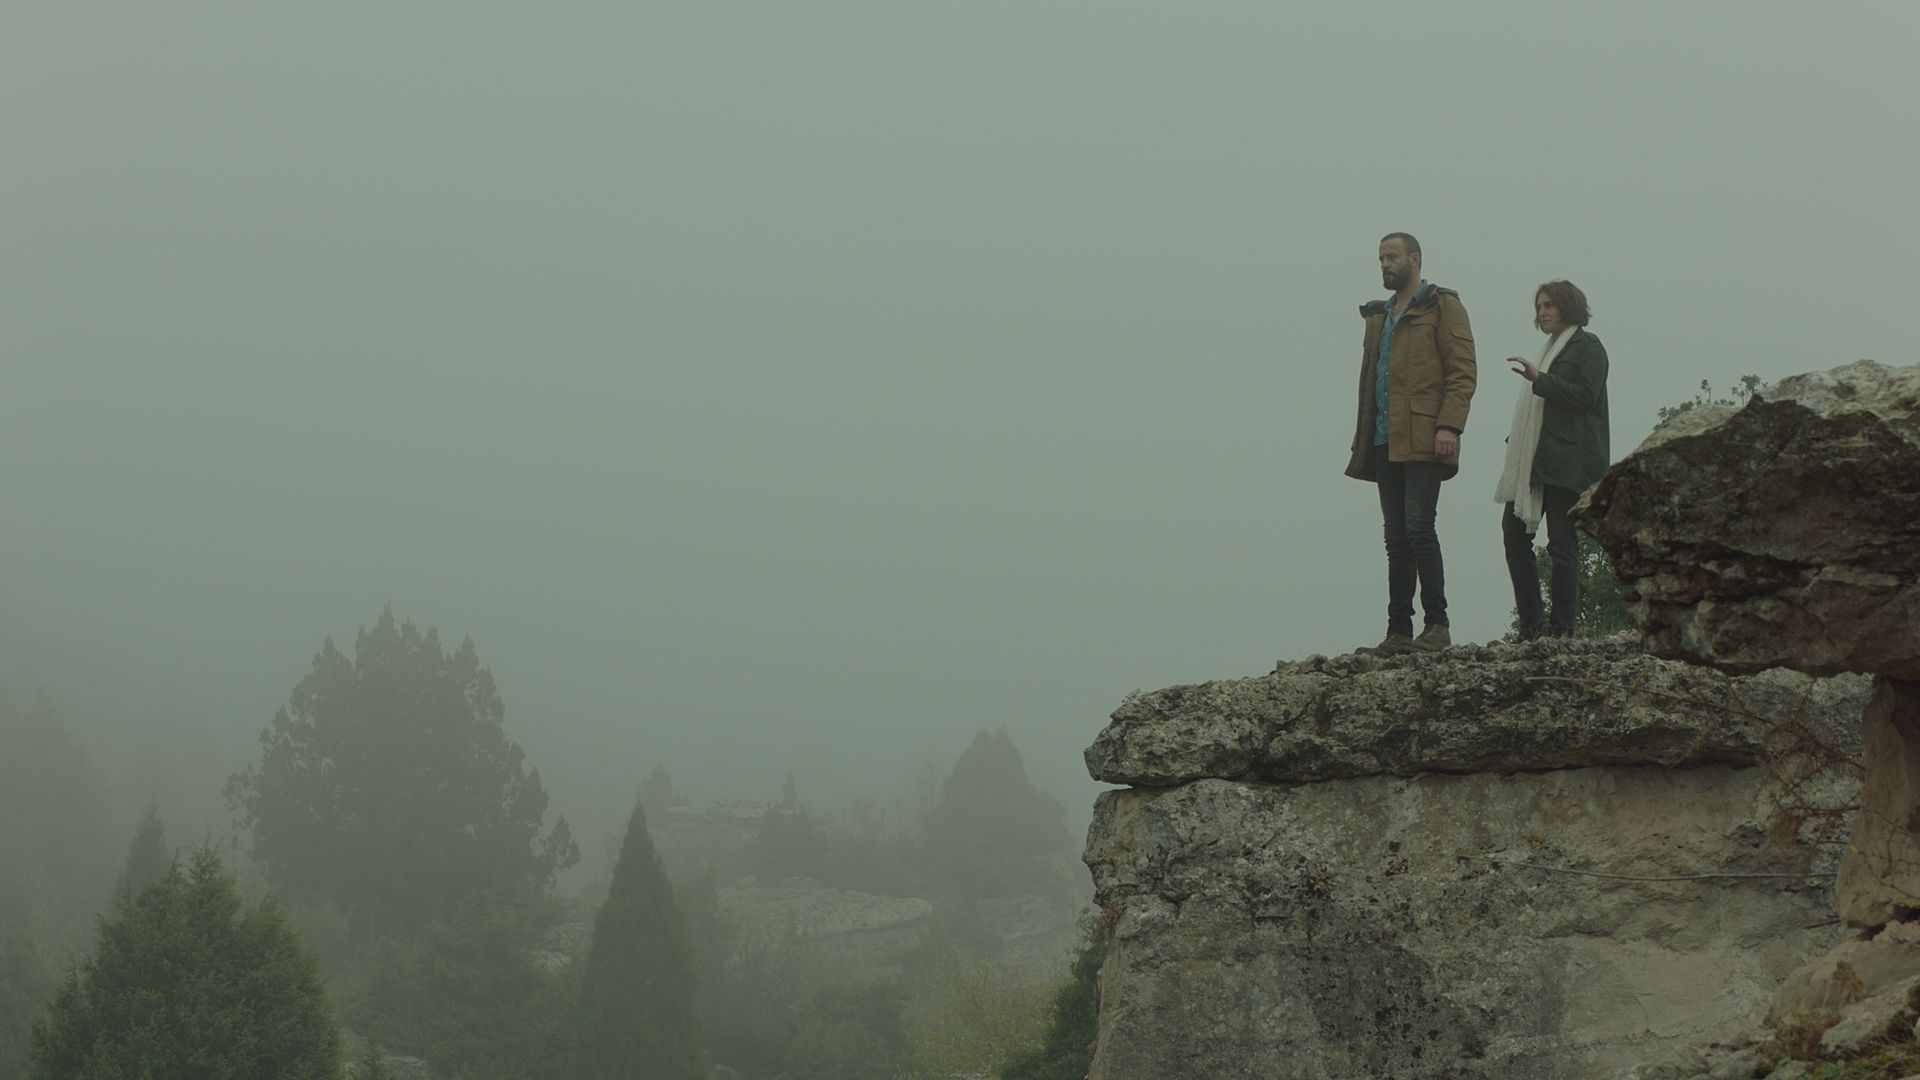 The River by Ghassan Salhab -فيلم النهر إخراج غسان سلهب (3)